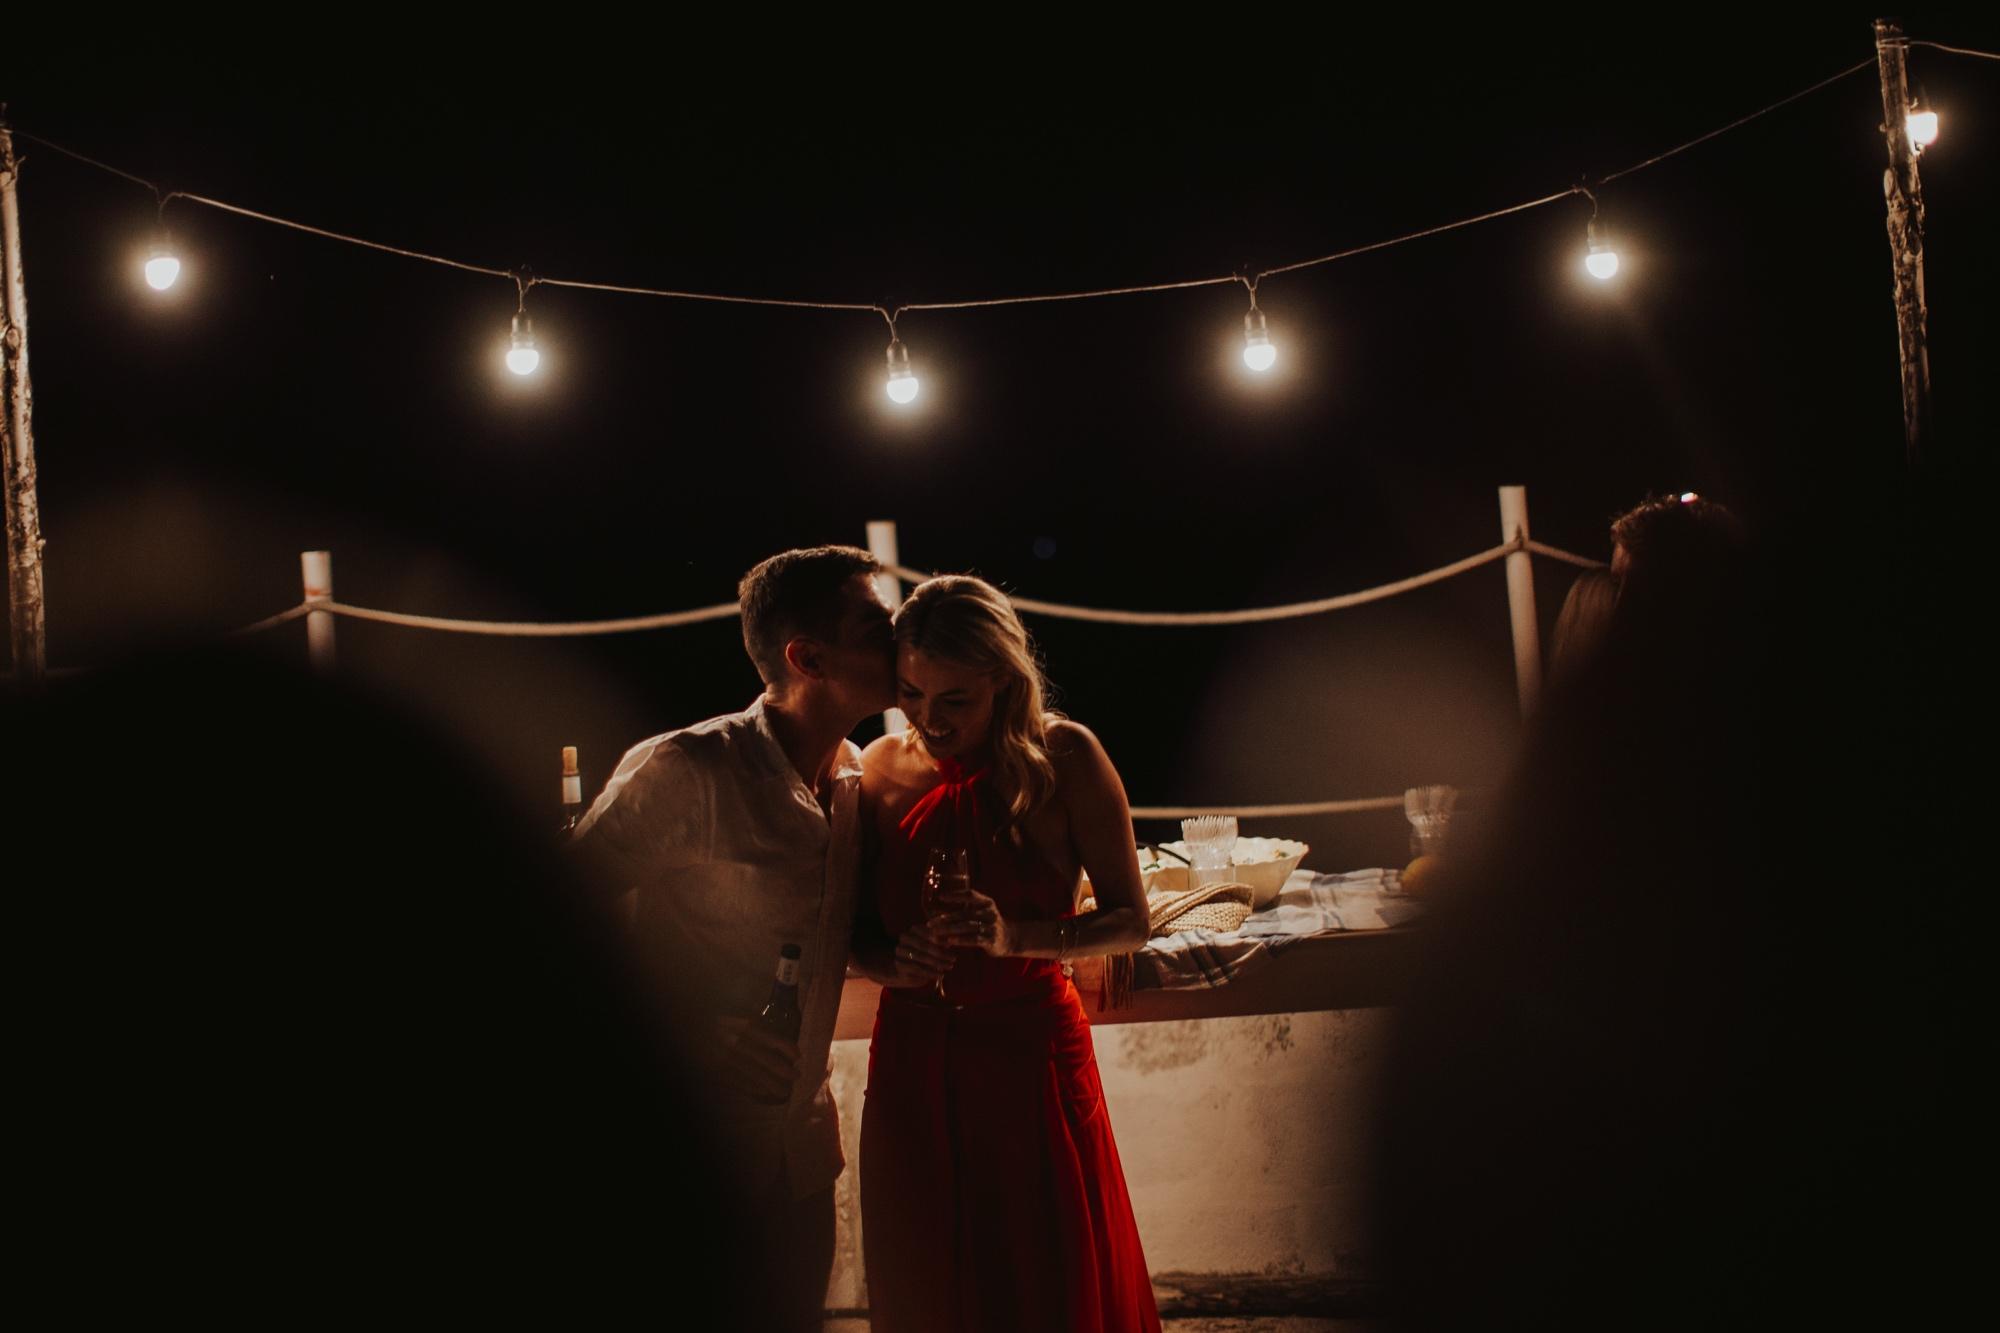 0000000012_IMG_2450_Weddings_Destination_Italy_got_Just_Engaged.jpg